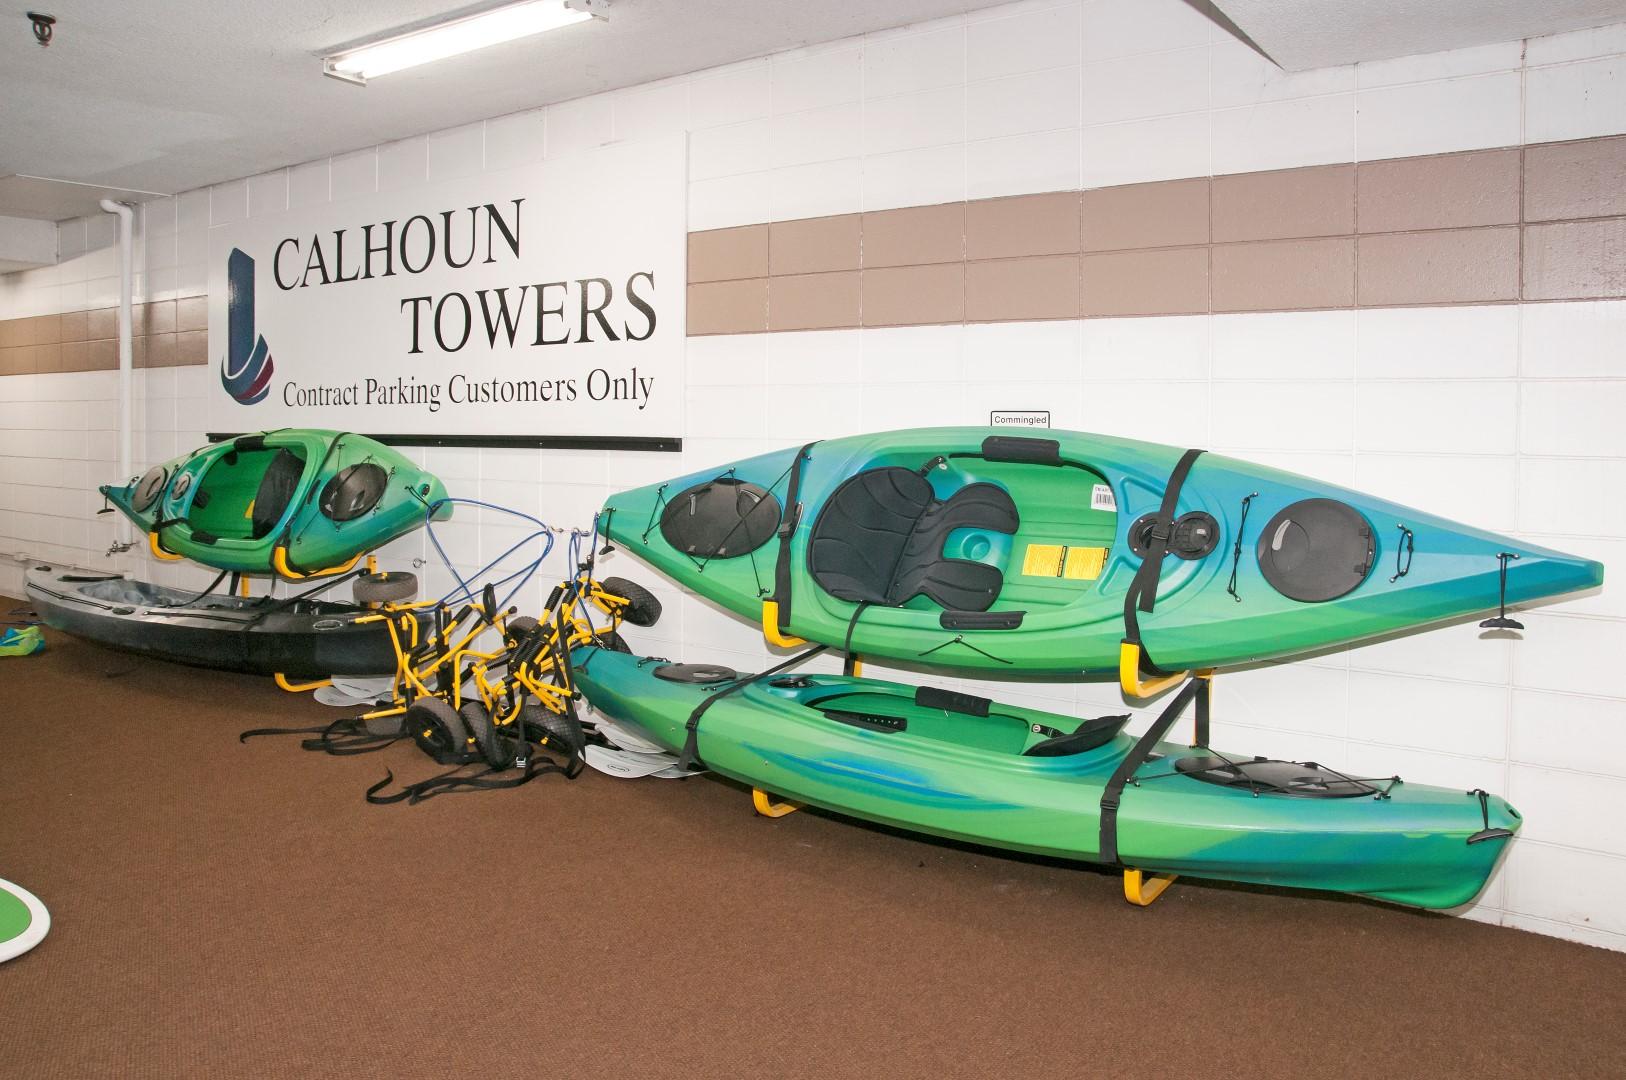 CalhounTowers_Minneapolis_MN_Rentals_1.jpg